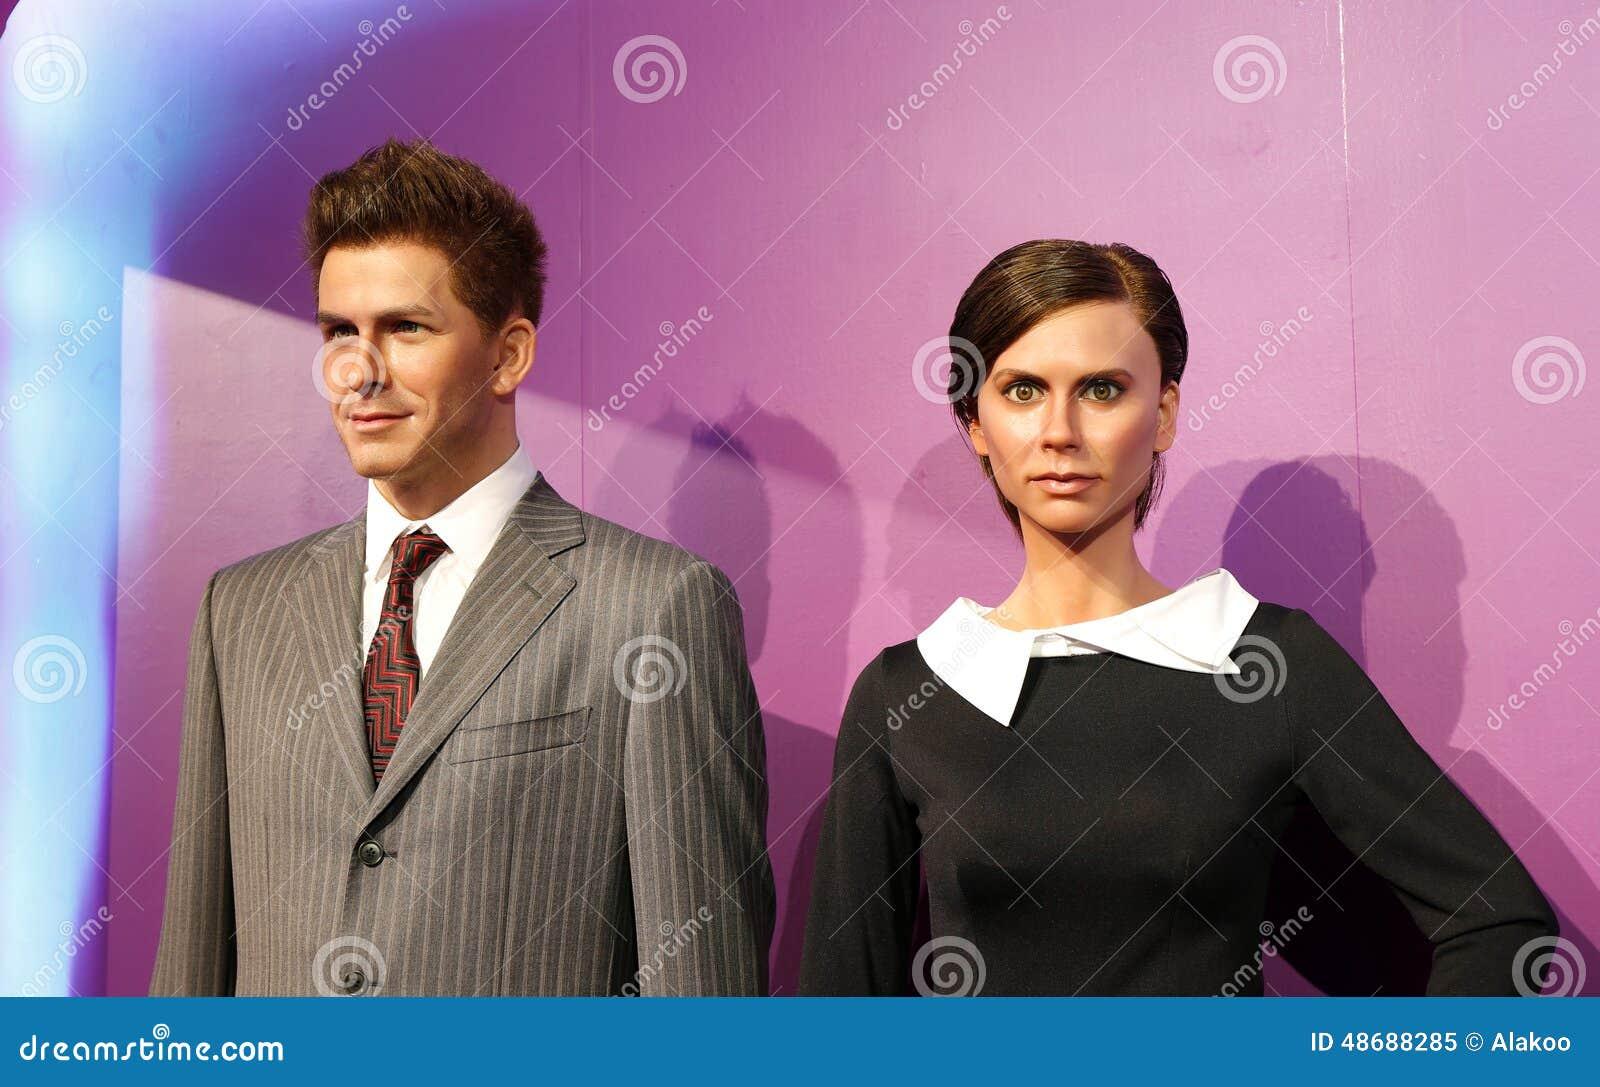 David Beckham y Victoria, estatua de la cera, figura de cera, figura de cera